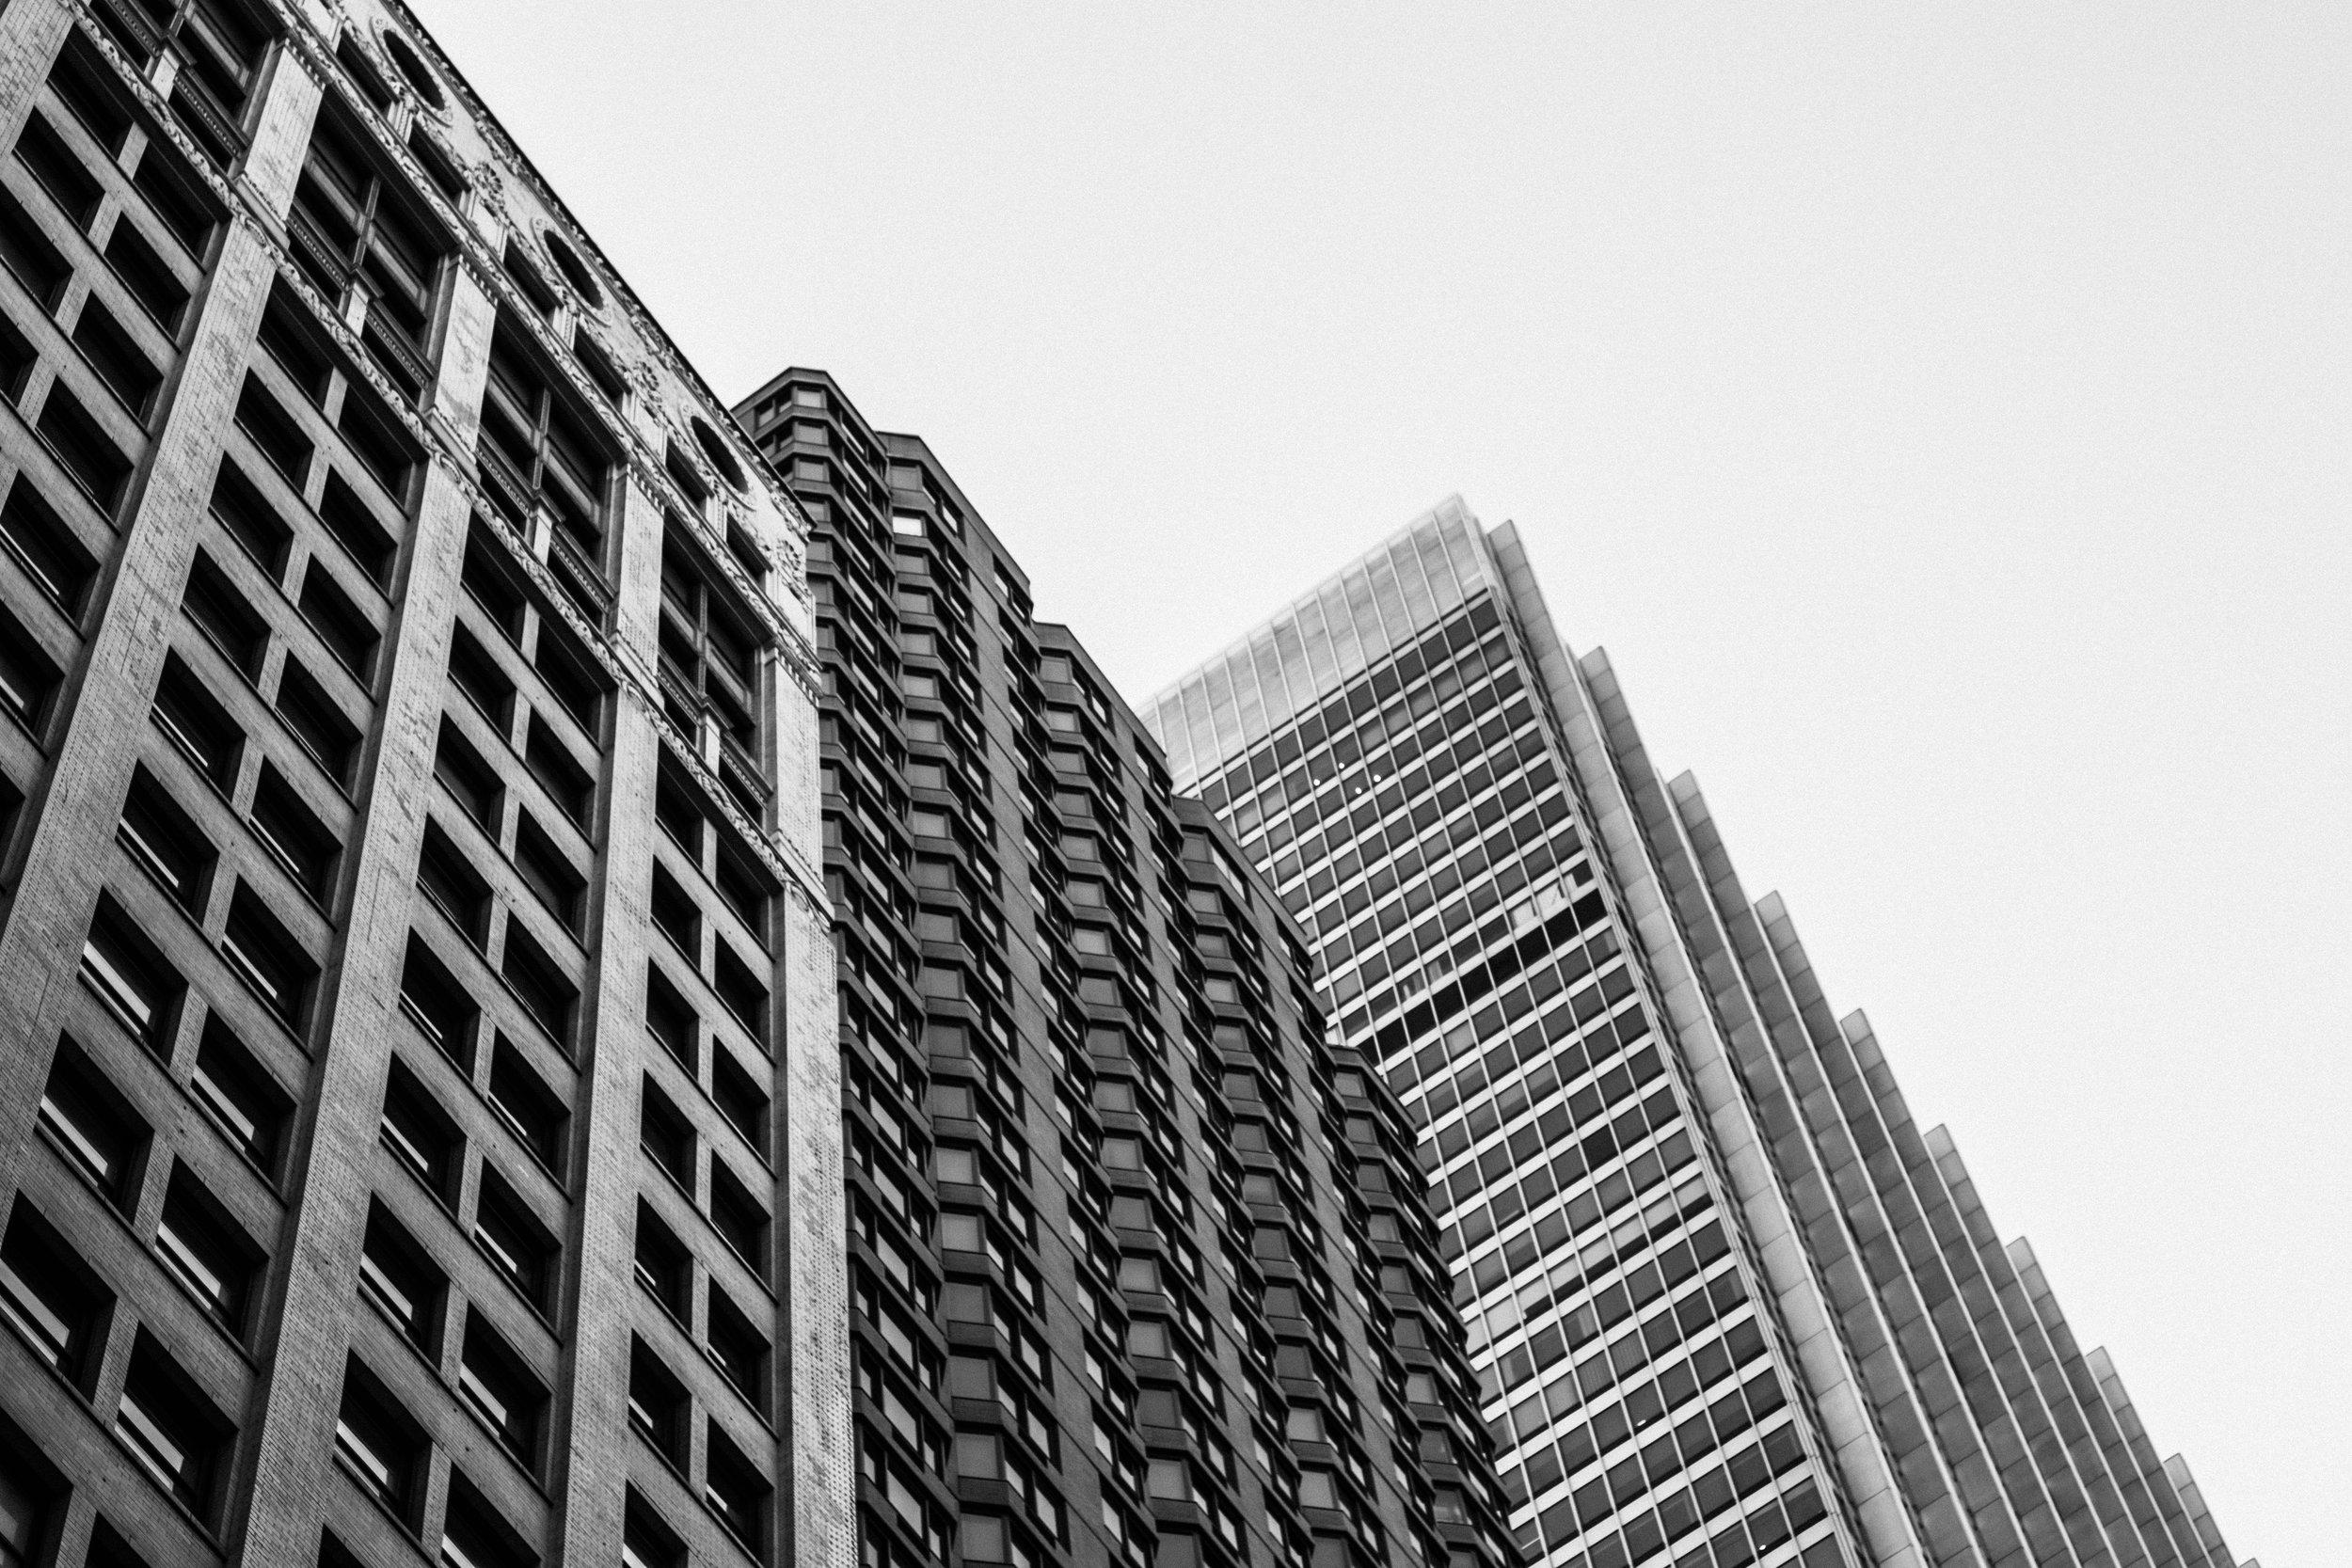 WALL STREET-8.JPG